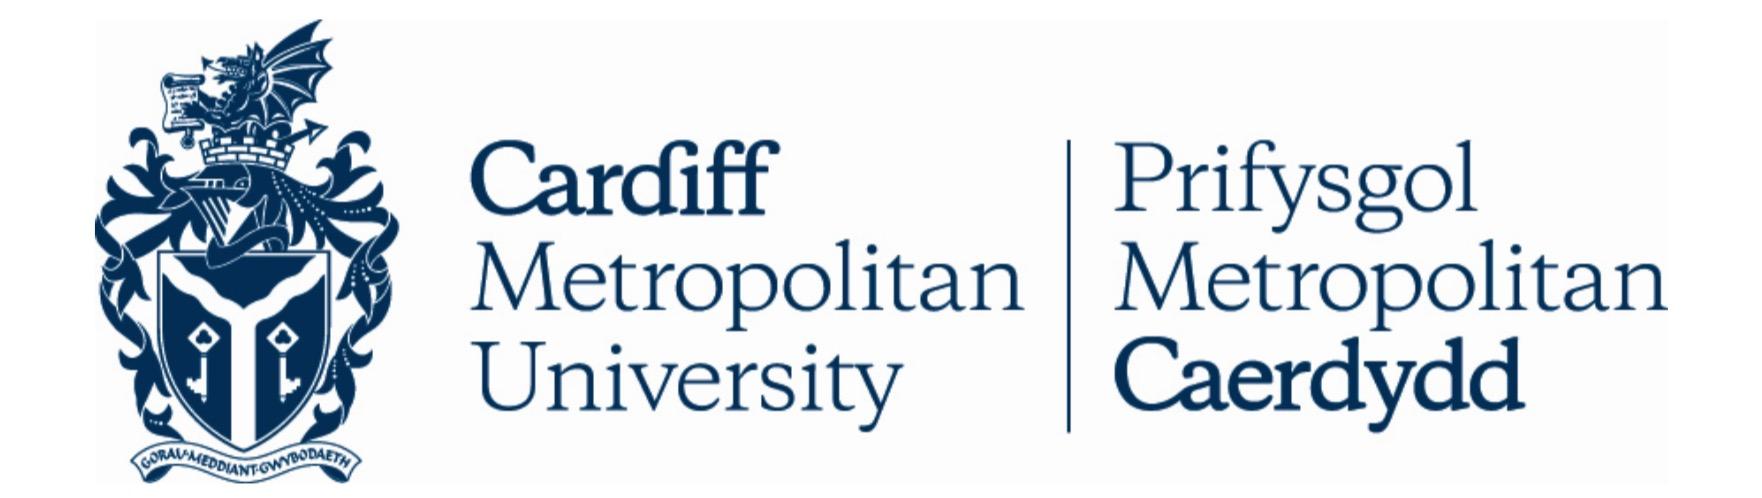 CardiffMet logo.jpg